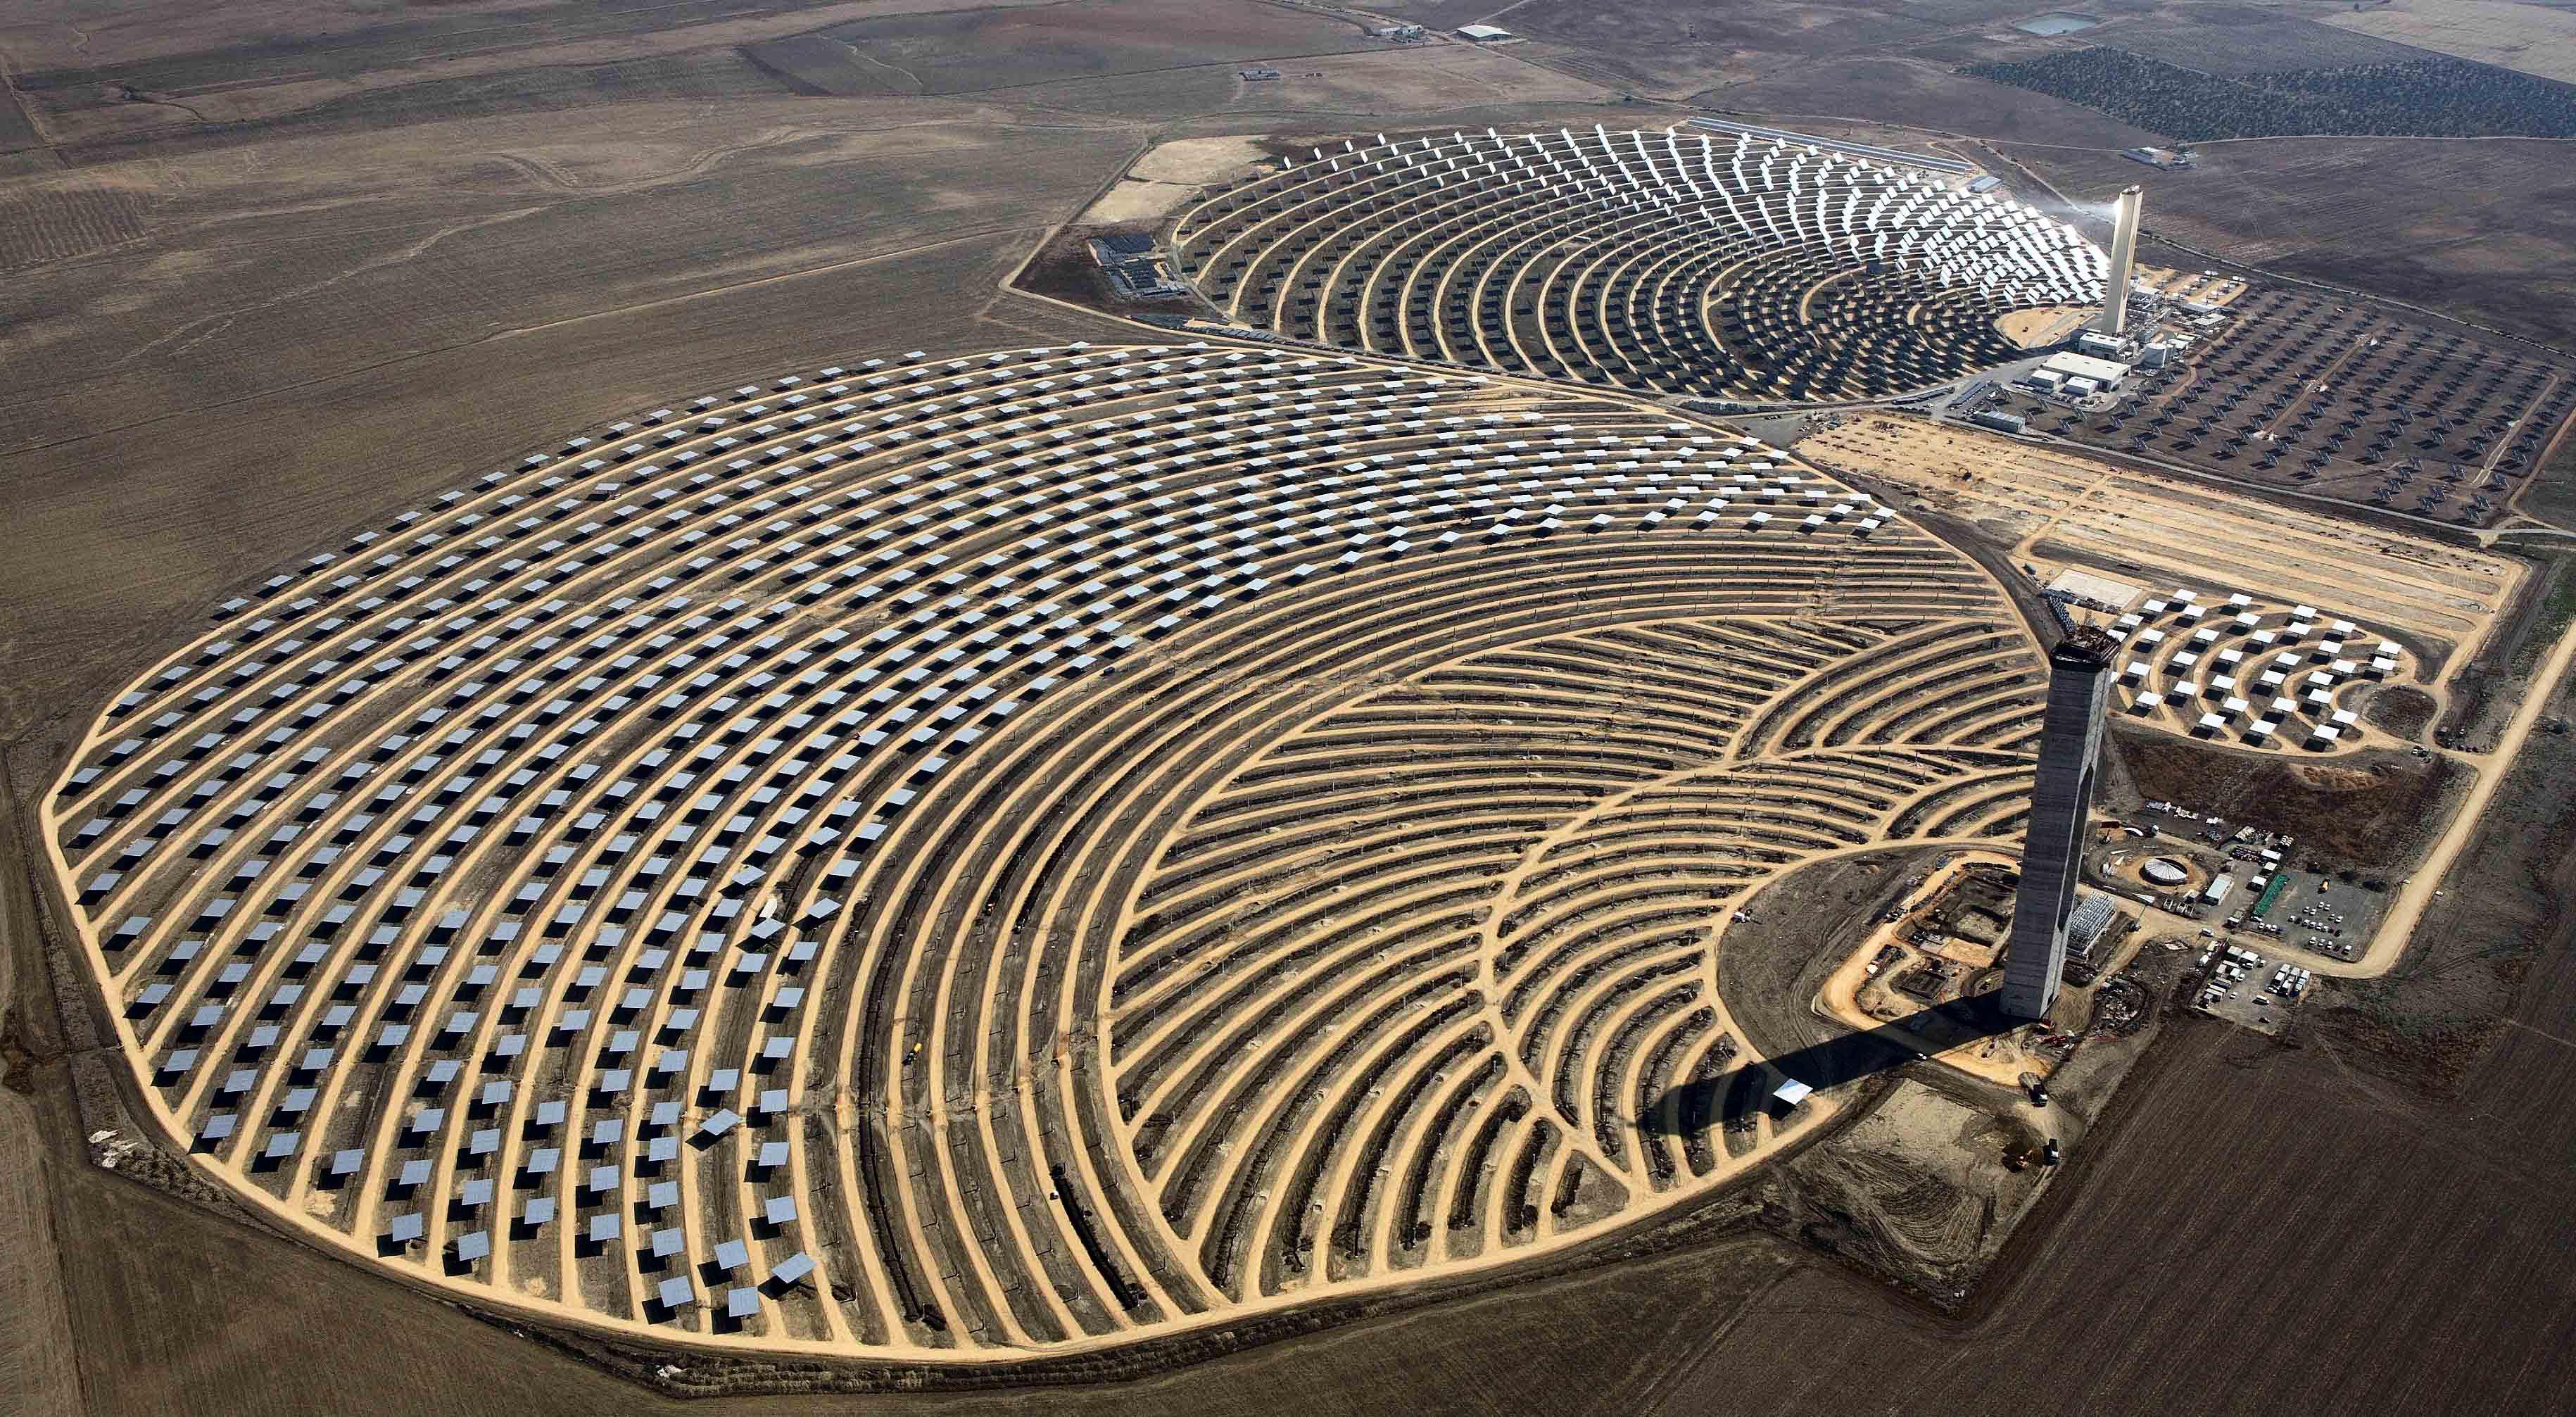 Andalucía, líder en termosolar y encabeza la energía solar térmica